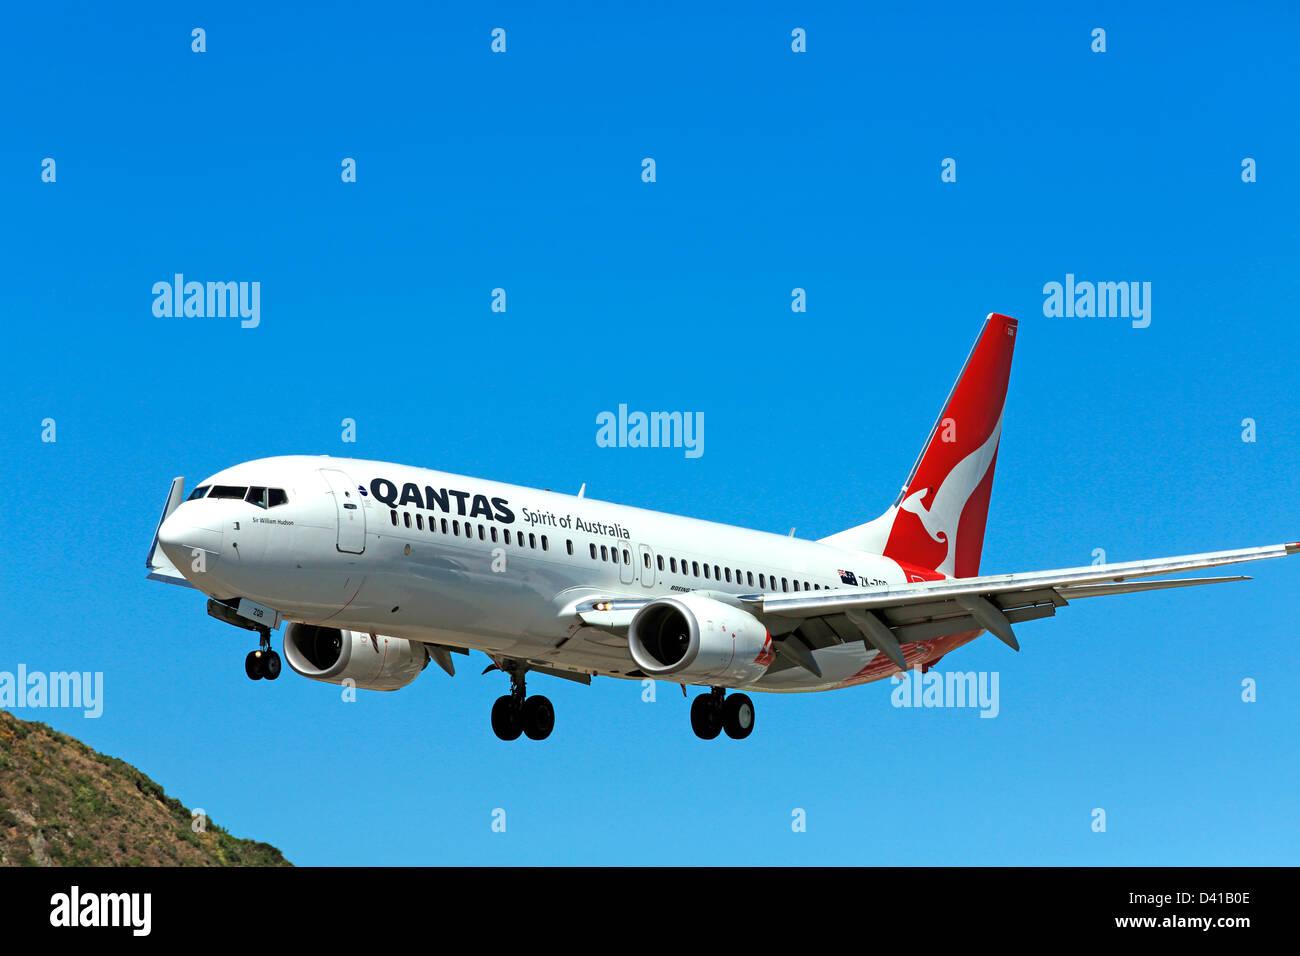 Qantas Boeing 737 landing at Wellington Airport - Stock Image